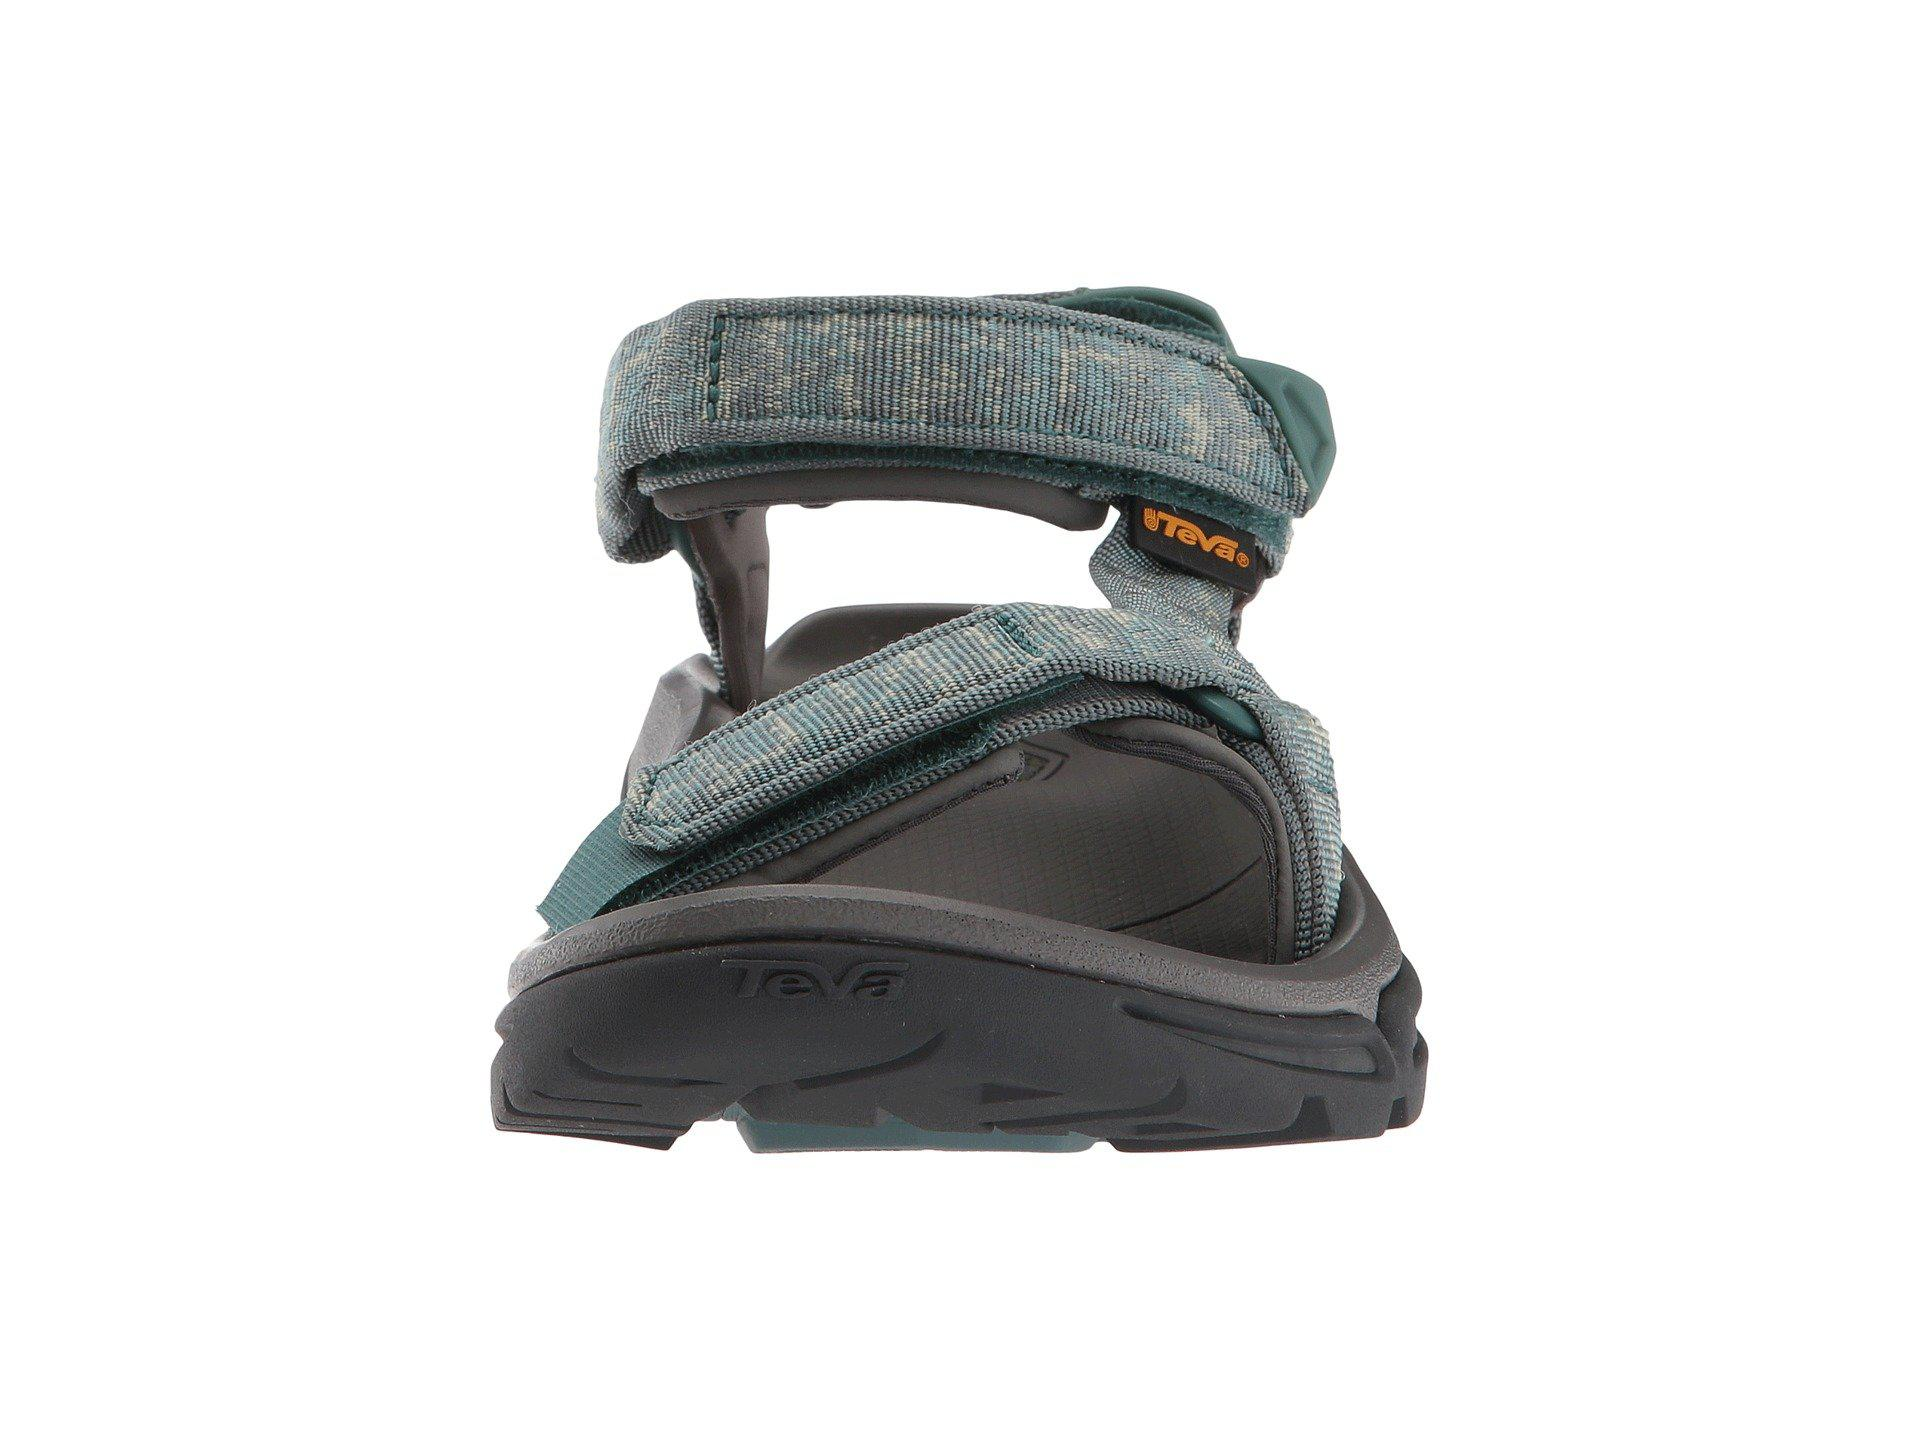 d0623b42d Teva - Gray Terra Fi 4 (rocio North Atlantic) Women s Shoes - Lyst. View  fullscreen